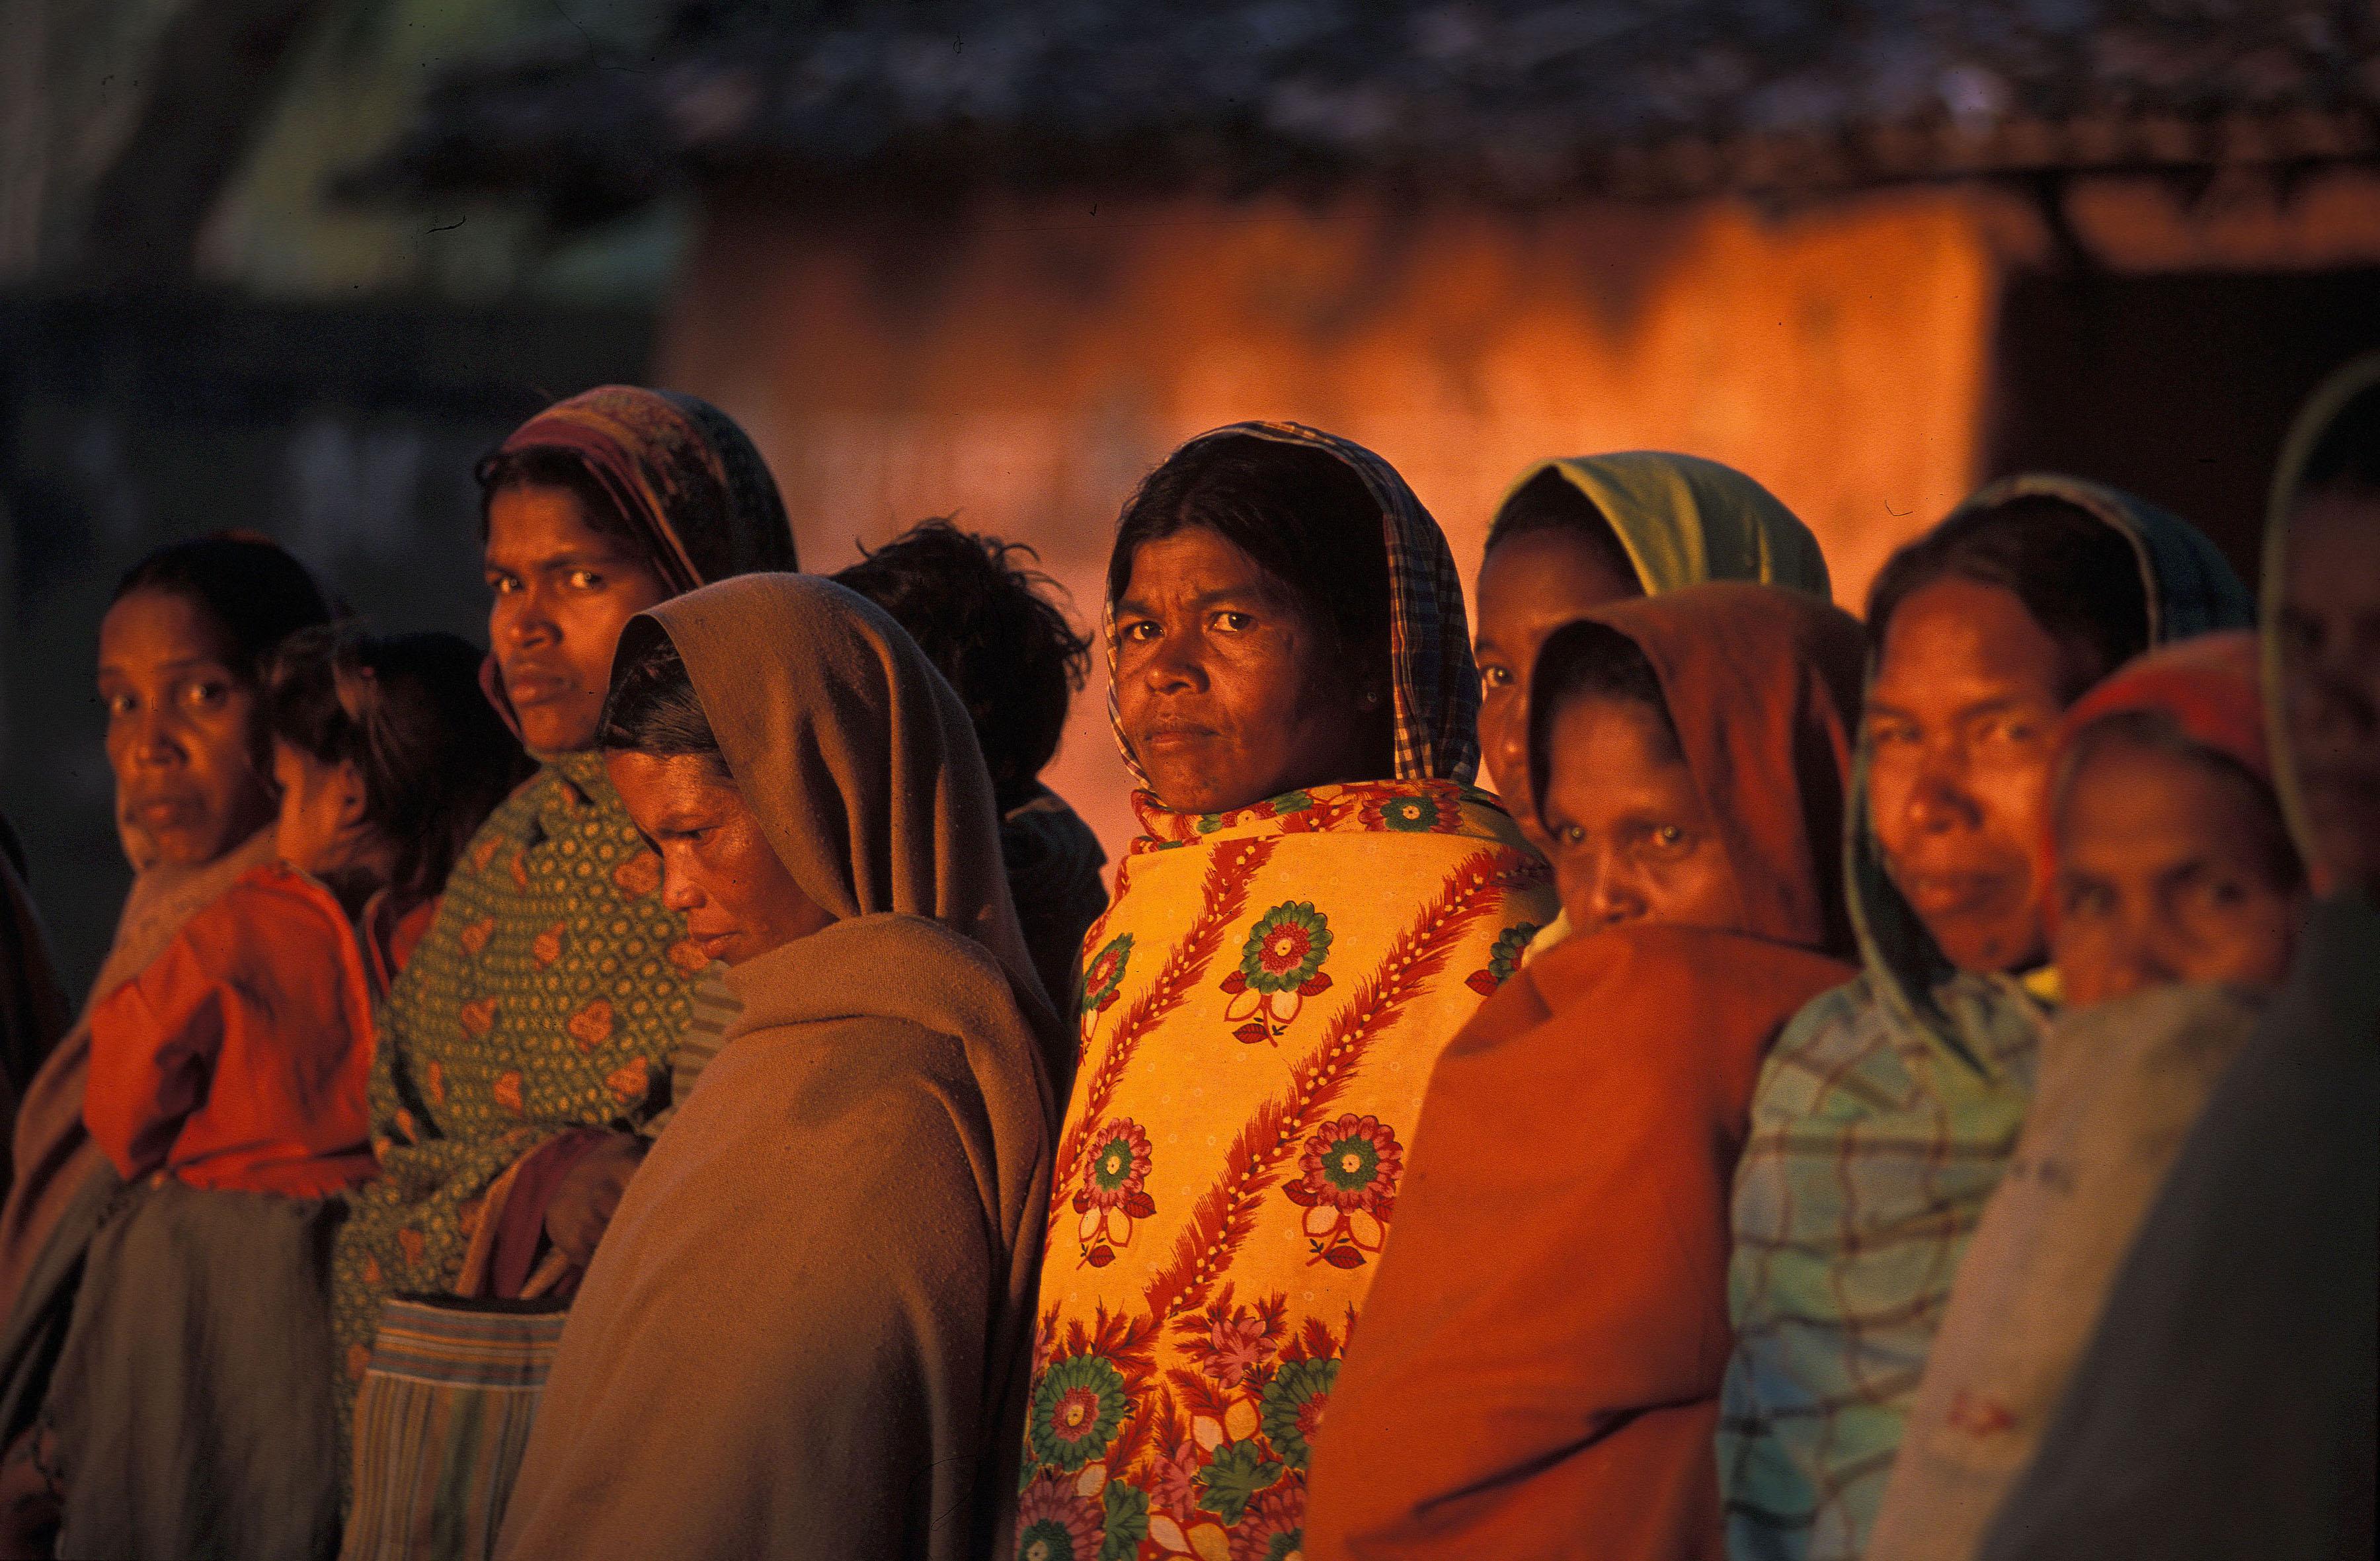 File:Women in Deogarh morning, Orissa, India.jpg - Wikimedia Commons